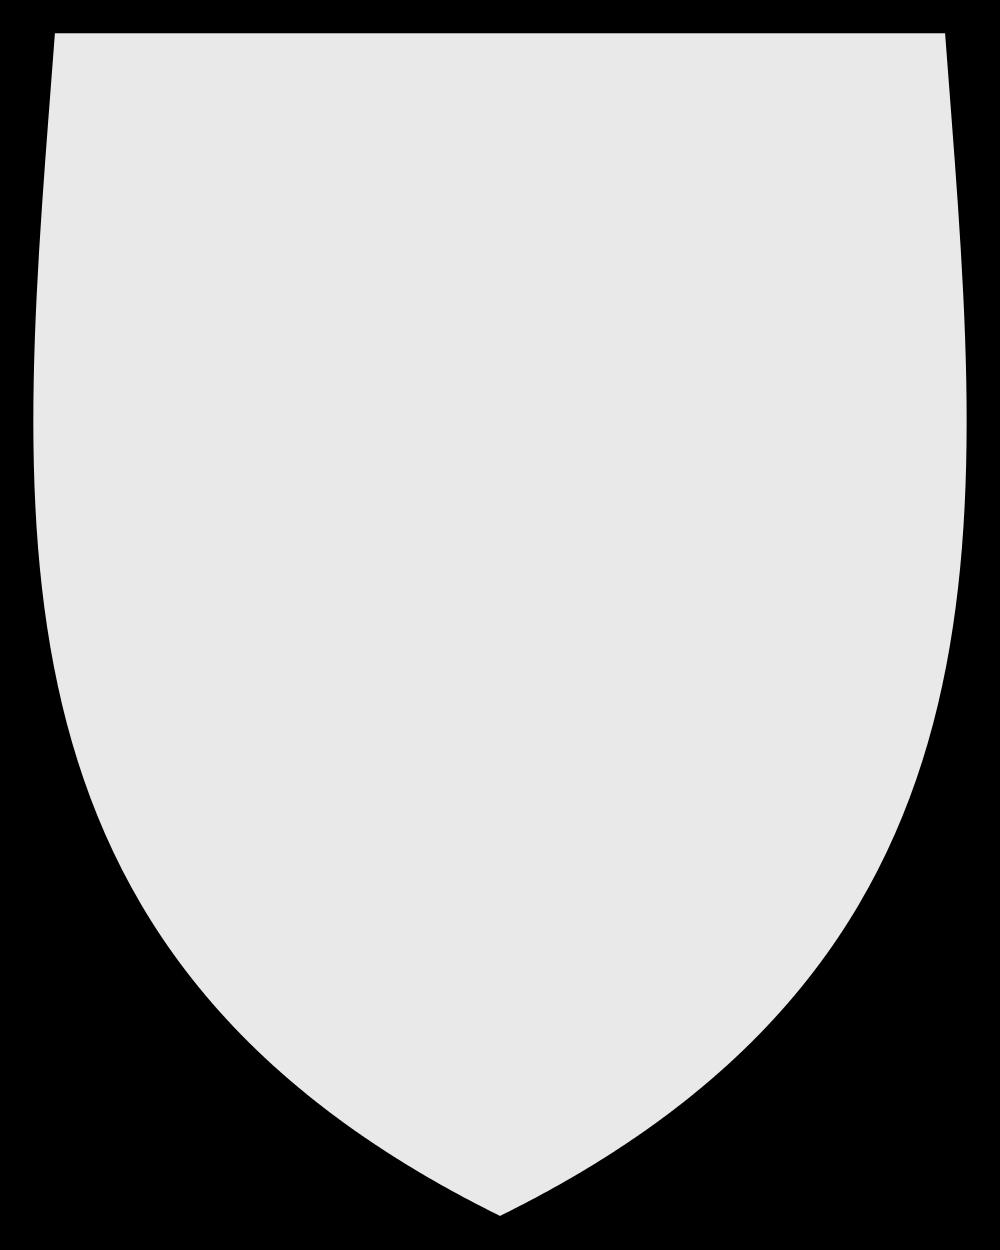 Shapes clipart shield. File coa illustration heater